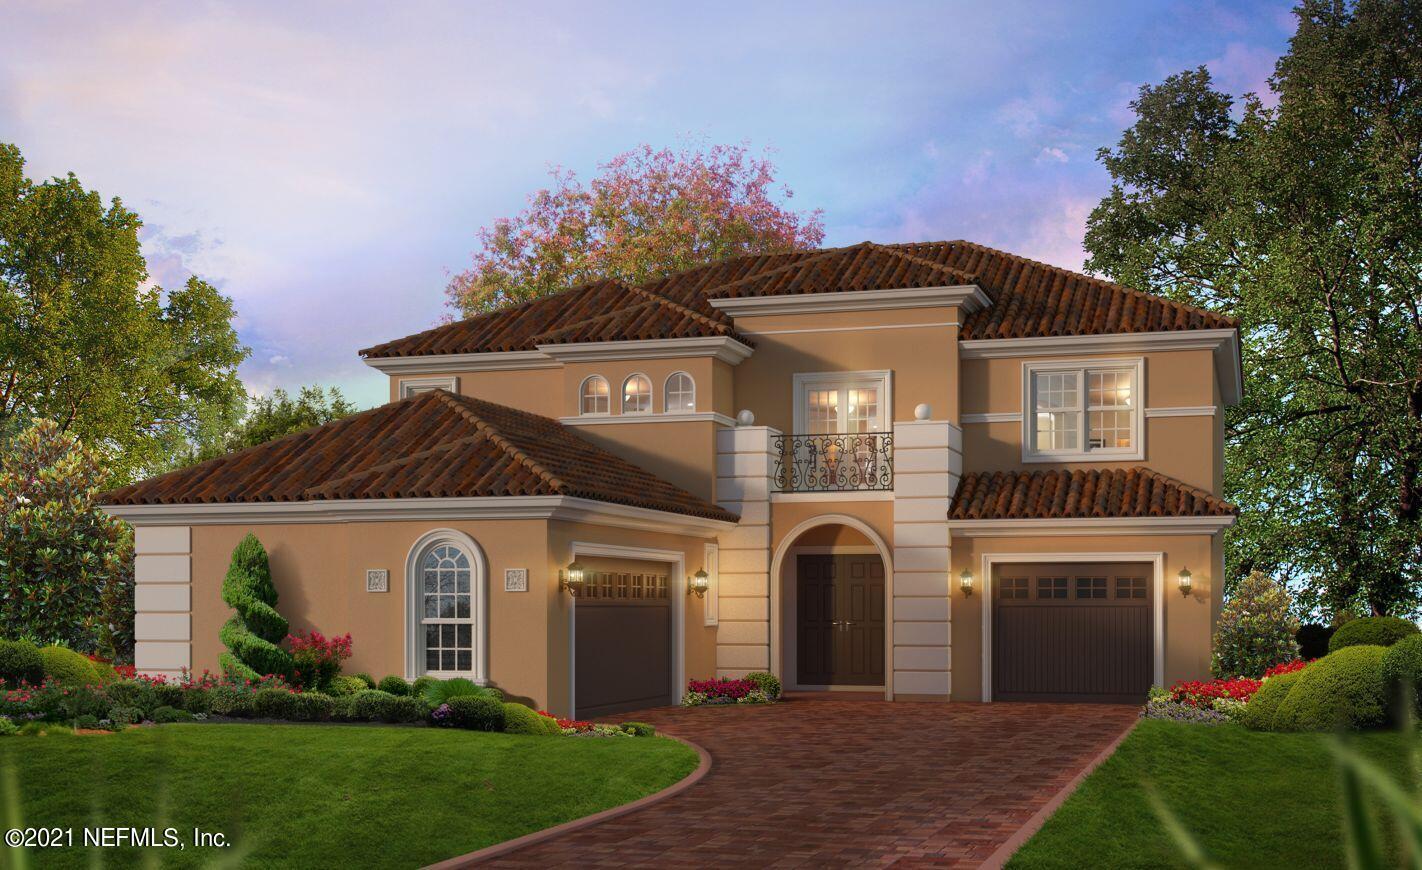 Listing Details for 2593 Cassia Ln, JACKSONVILLE, FL 32246